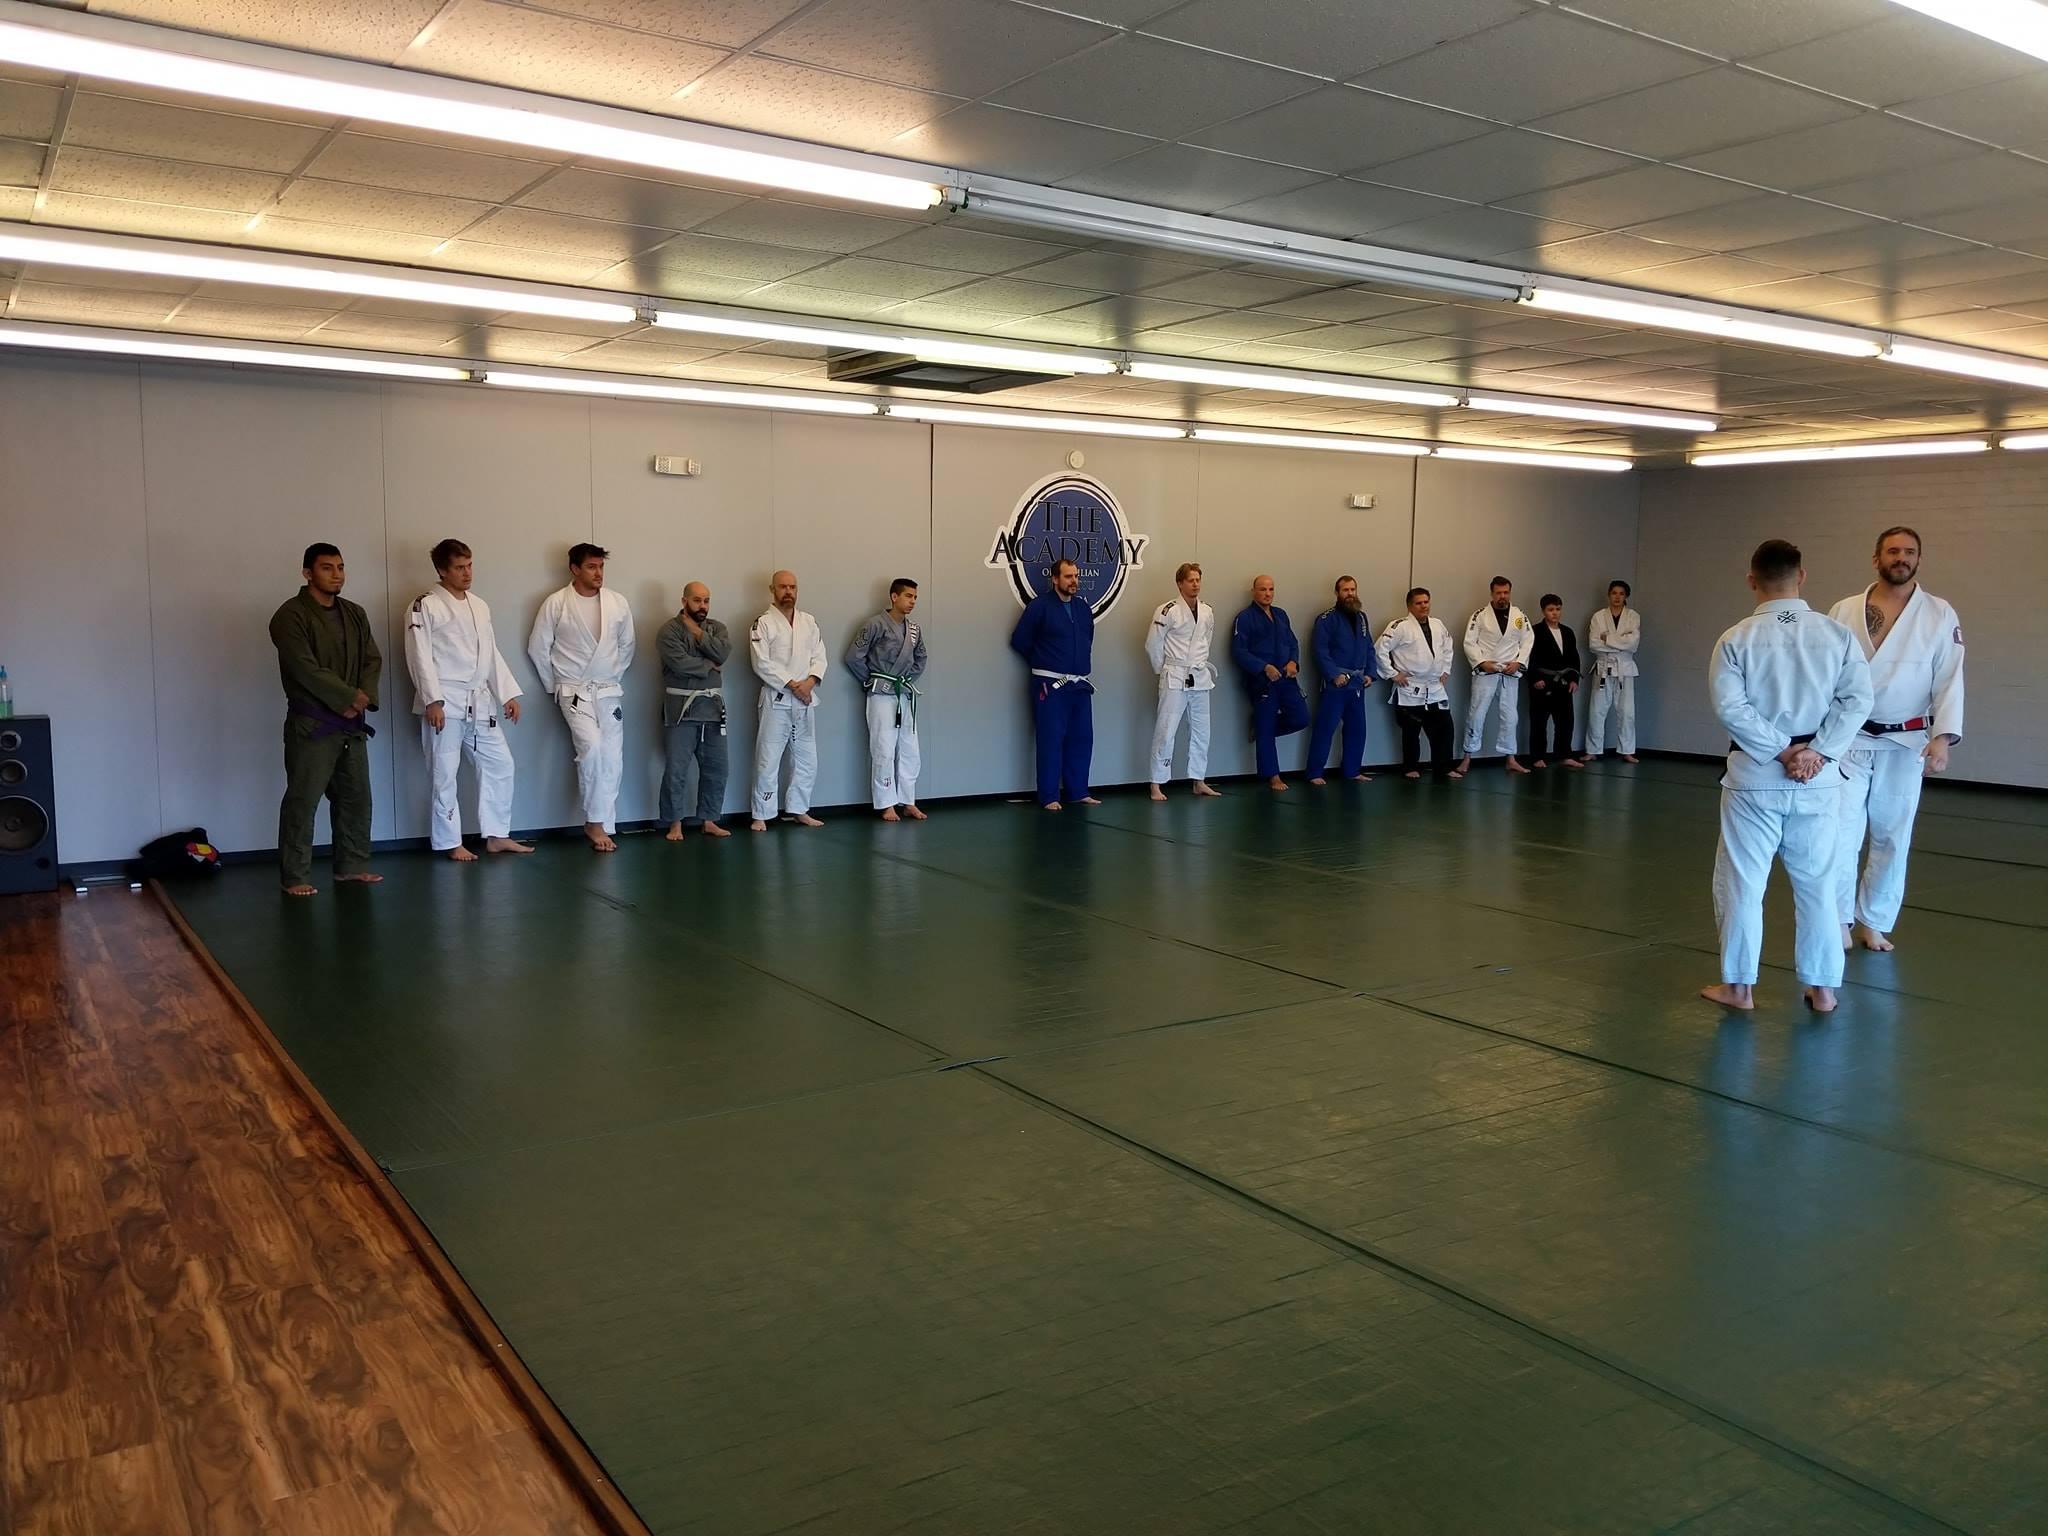 Arvada Brazilian Jiu Jitsu Programs